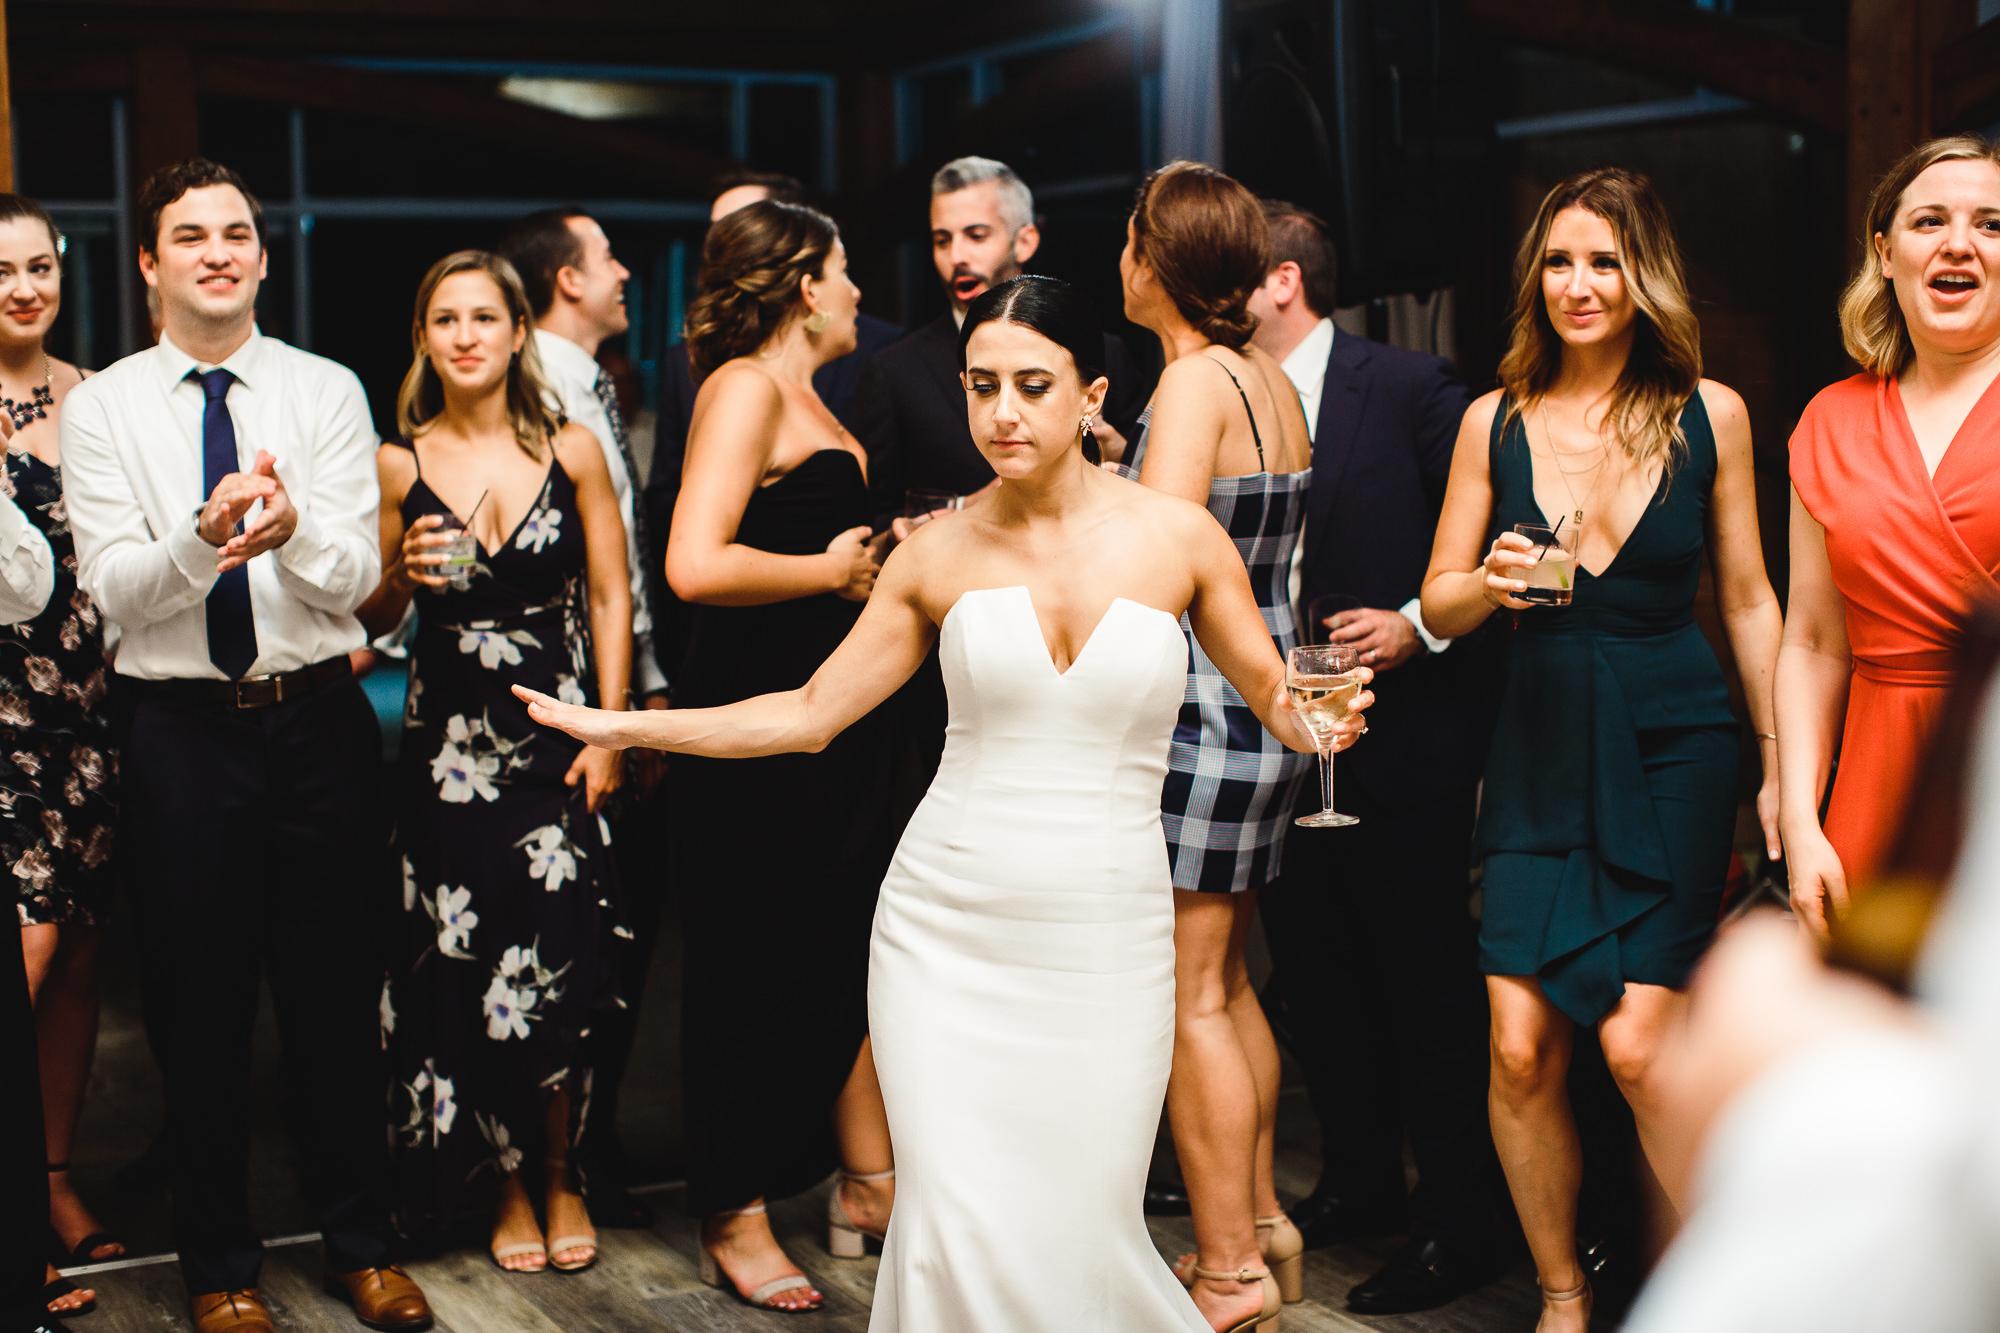 onteora-mountain-house-wedding (217 of 235).jpg